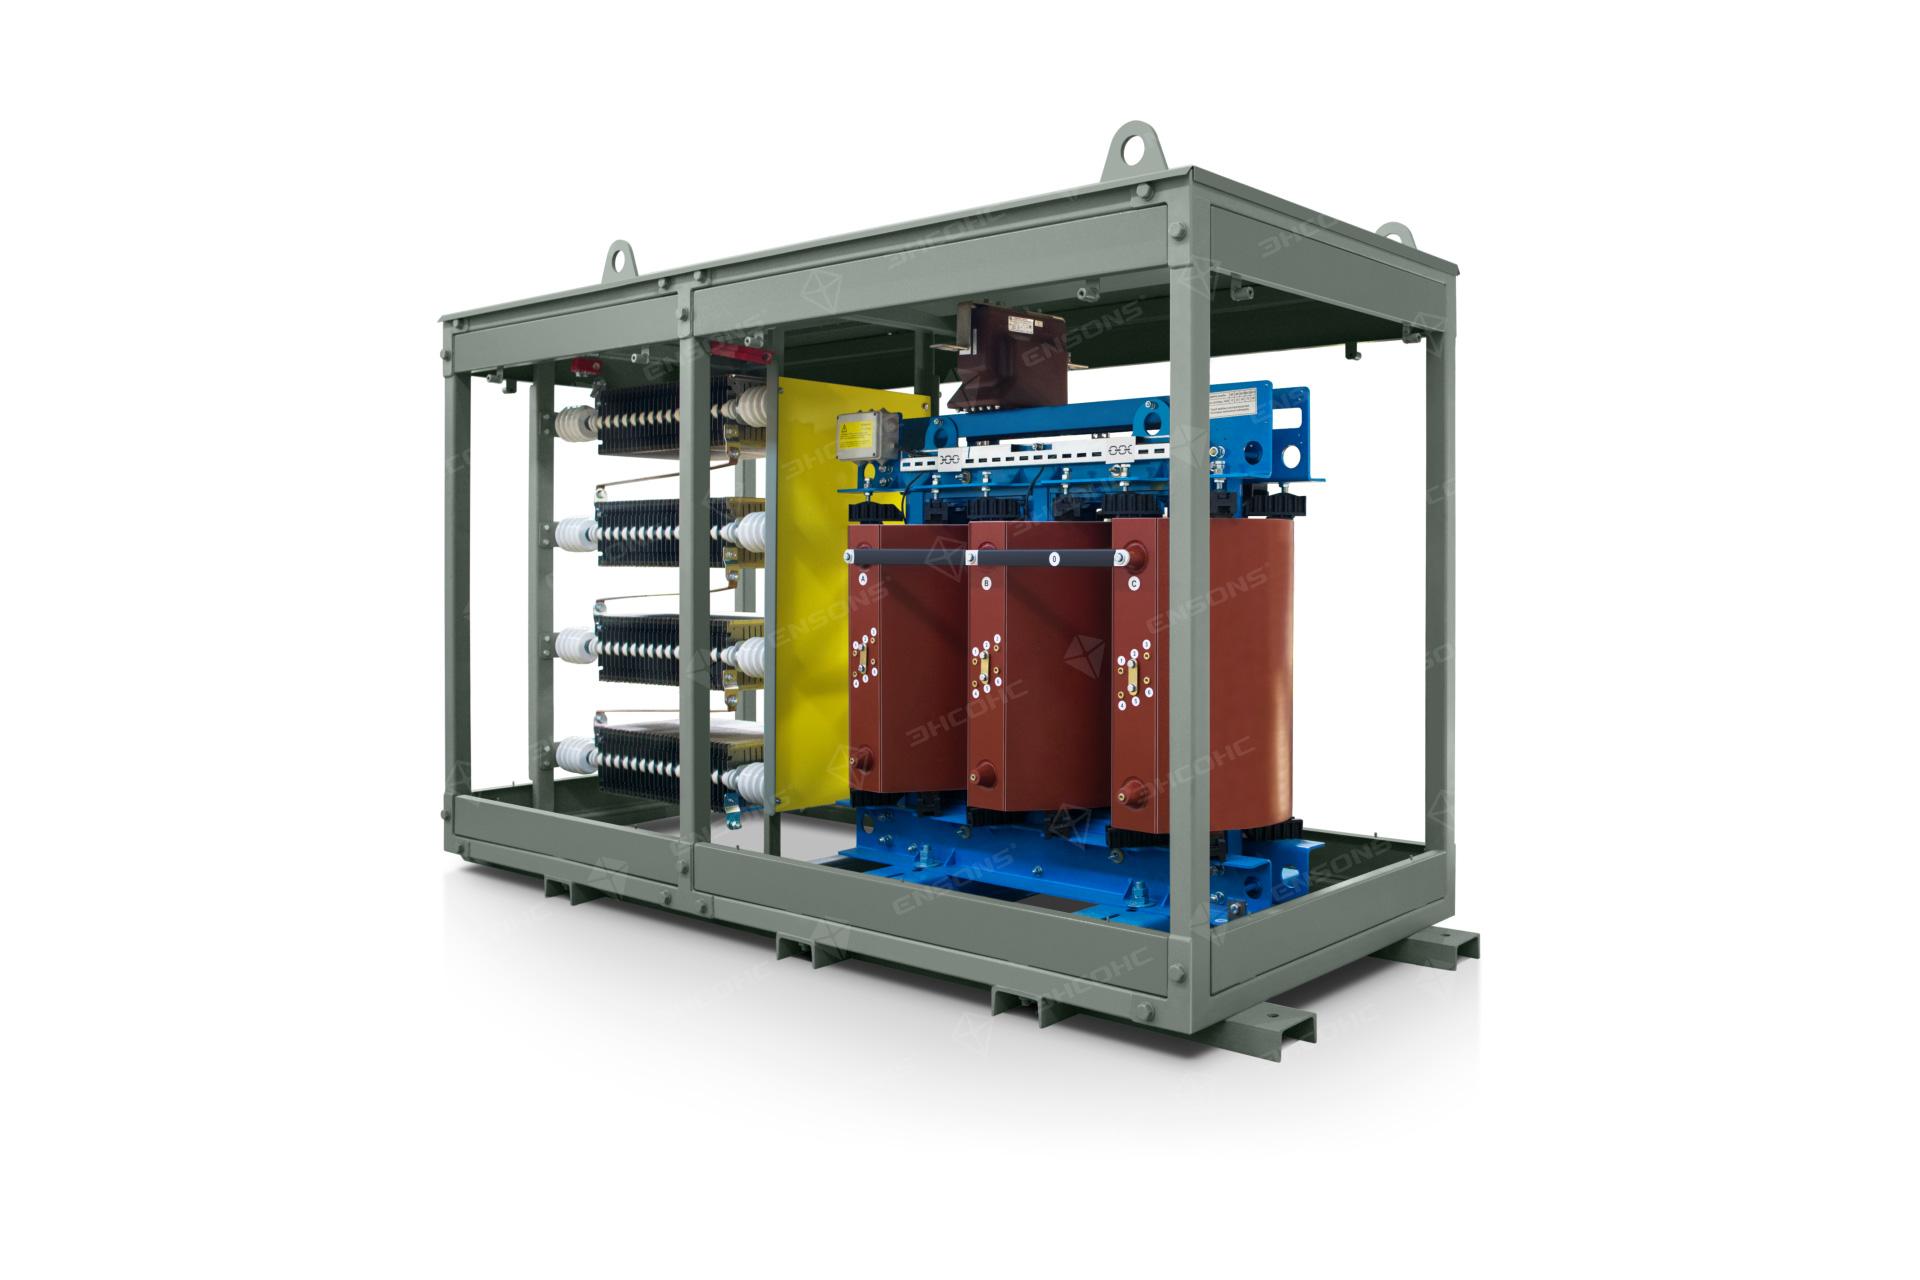 Ensons - УРЗН 6-10 кВ без защитных панелей